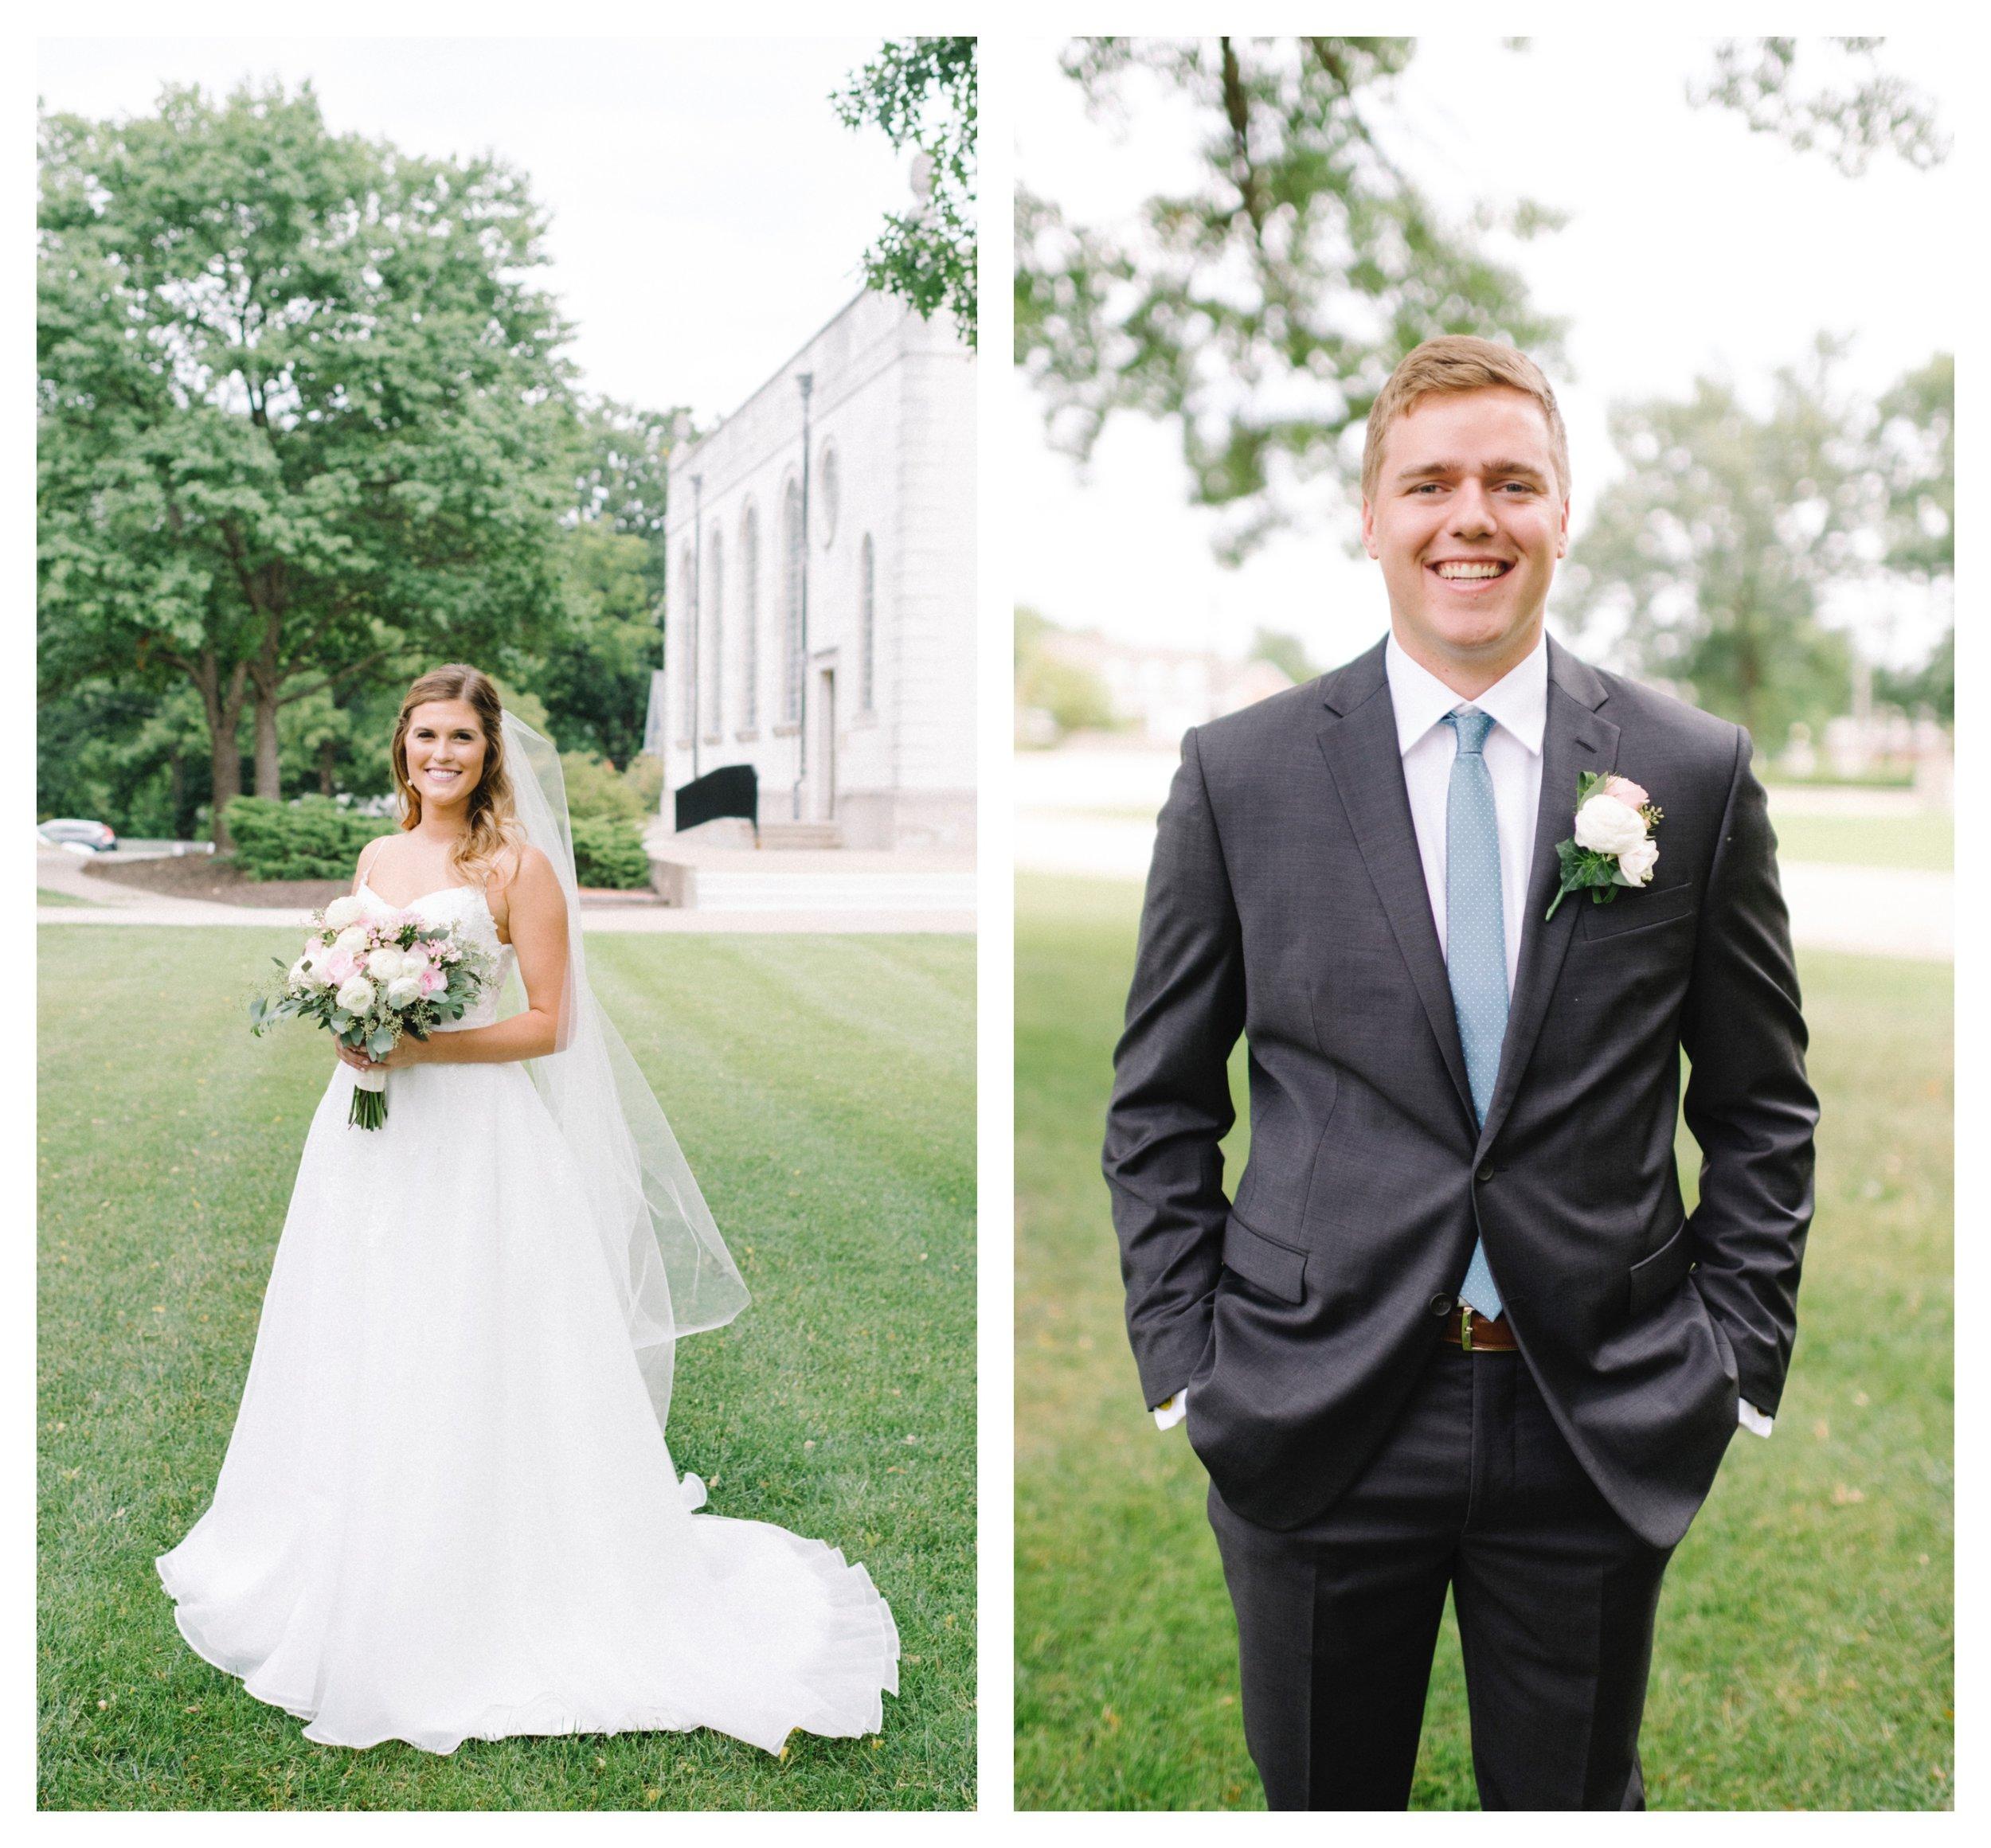 KansasCity_WeddingDress13